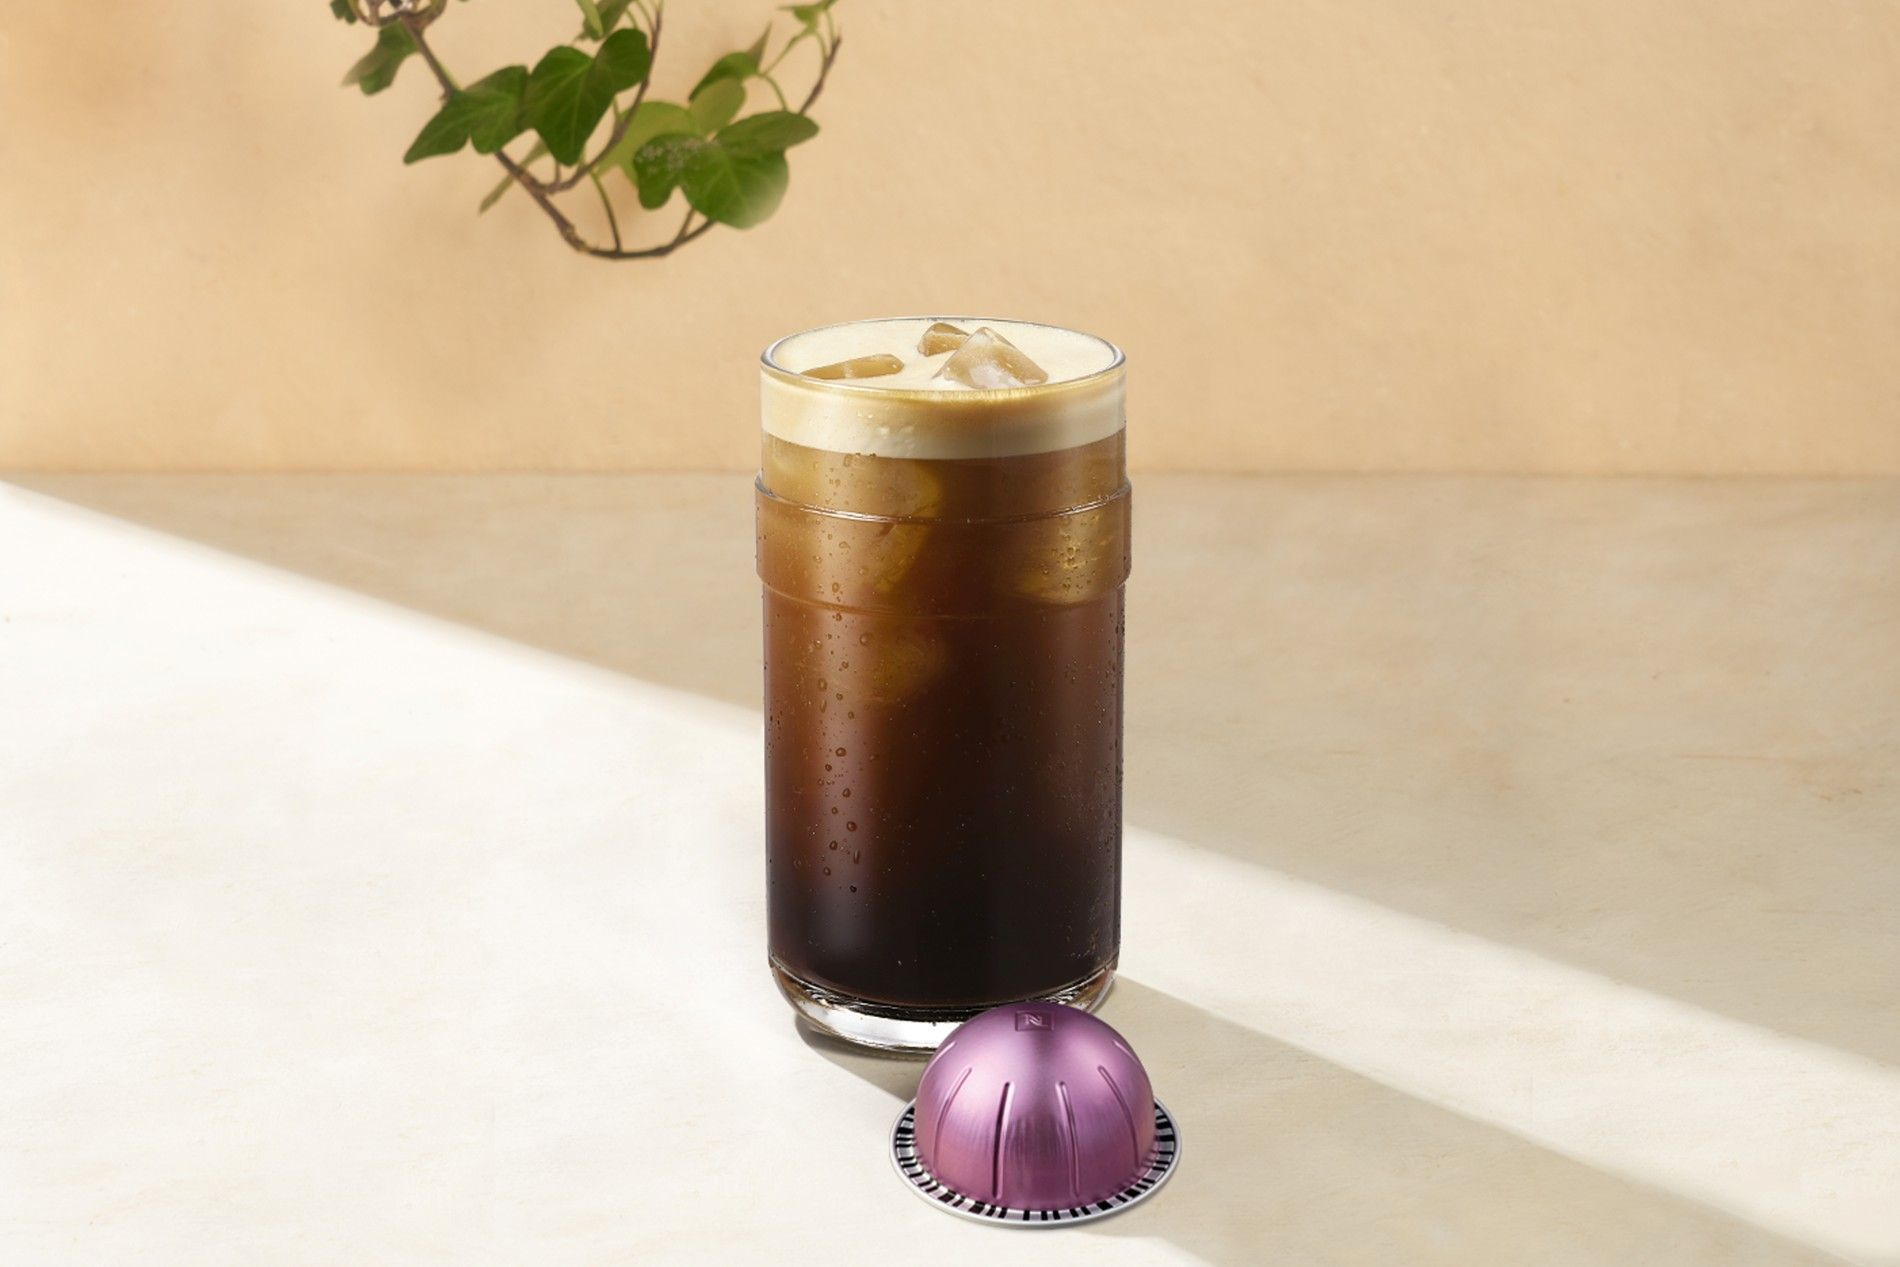 Nespresso Vertuo on Ice Recipe Nespresso recipes